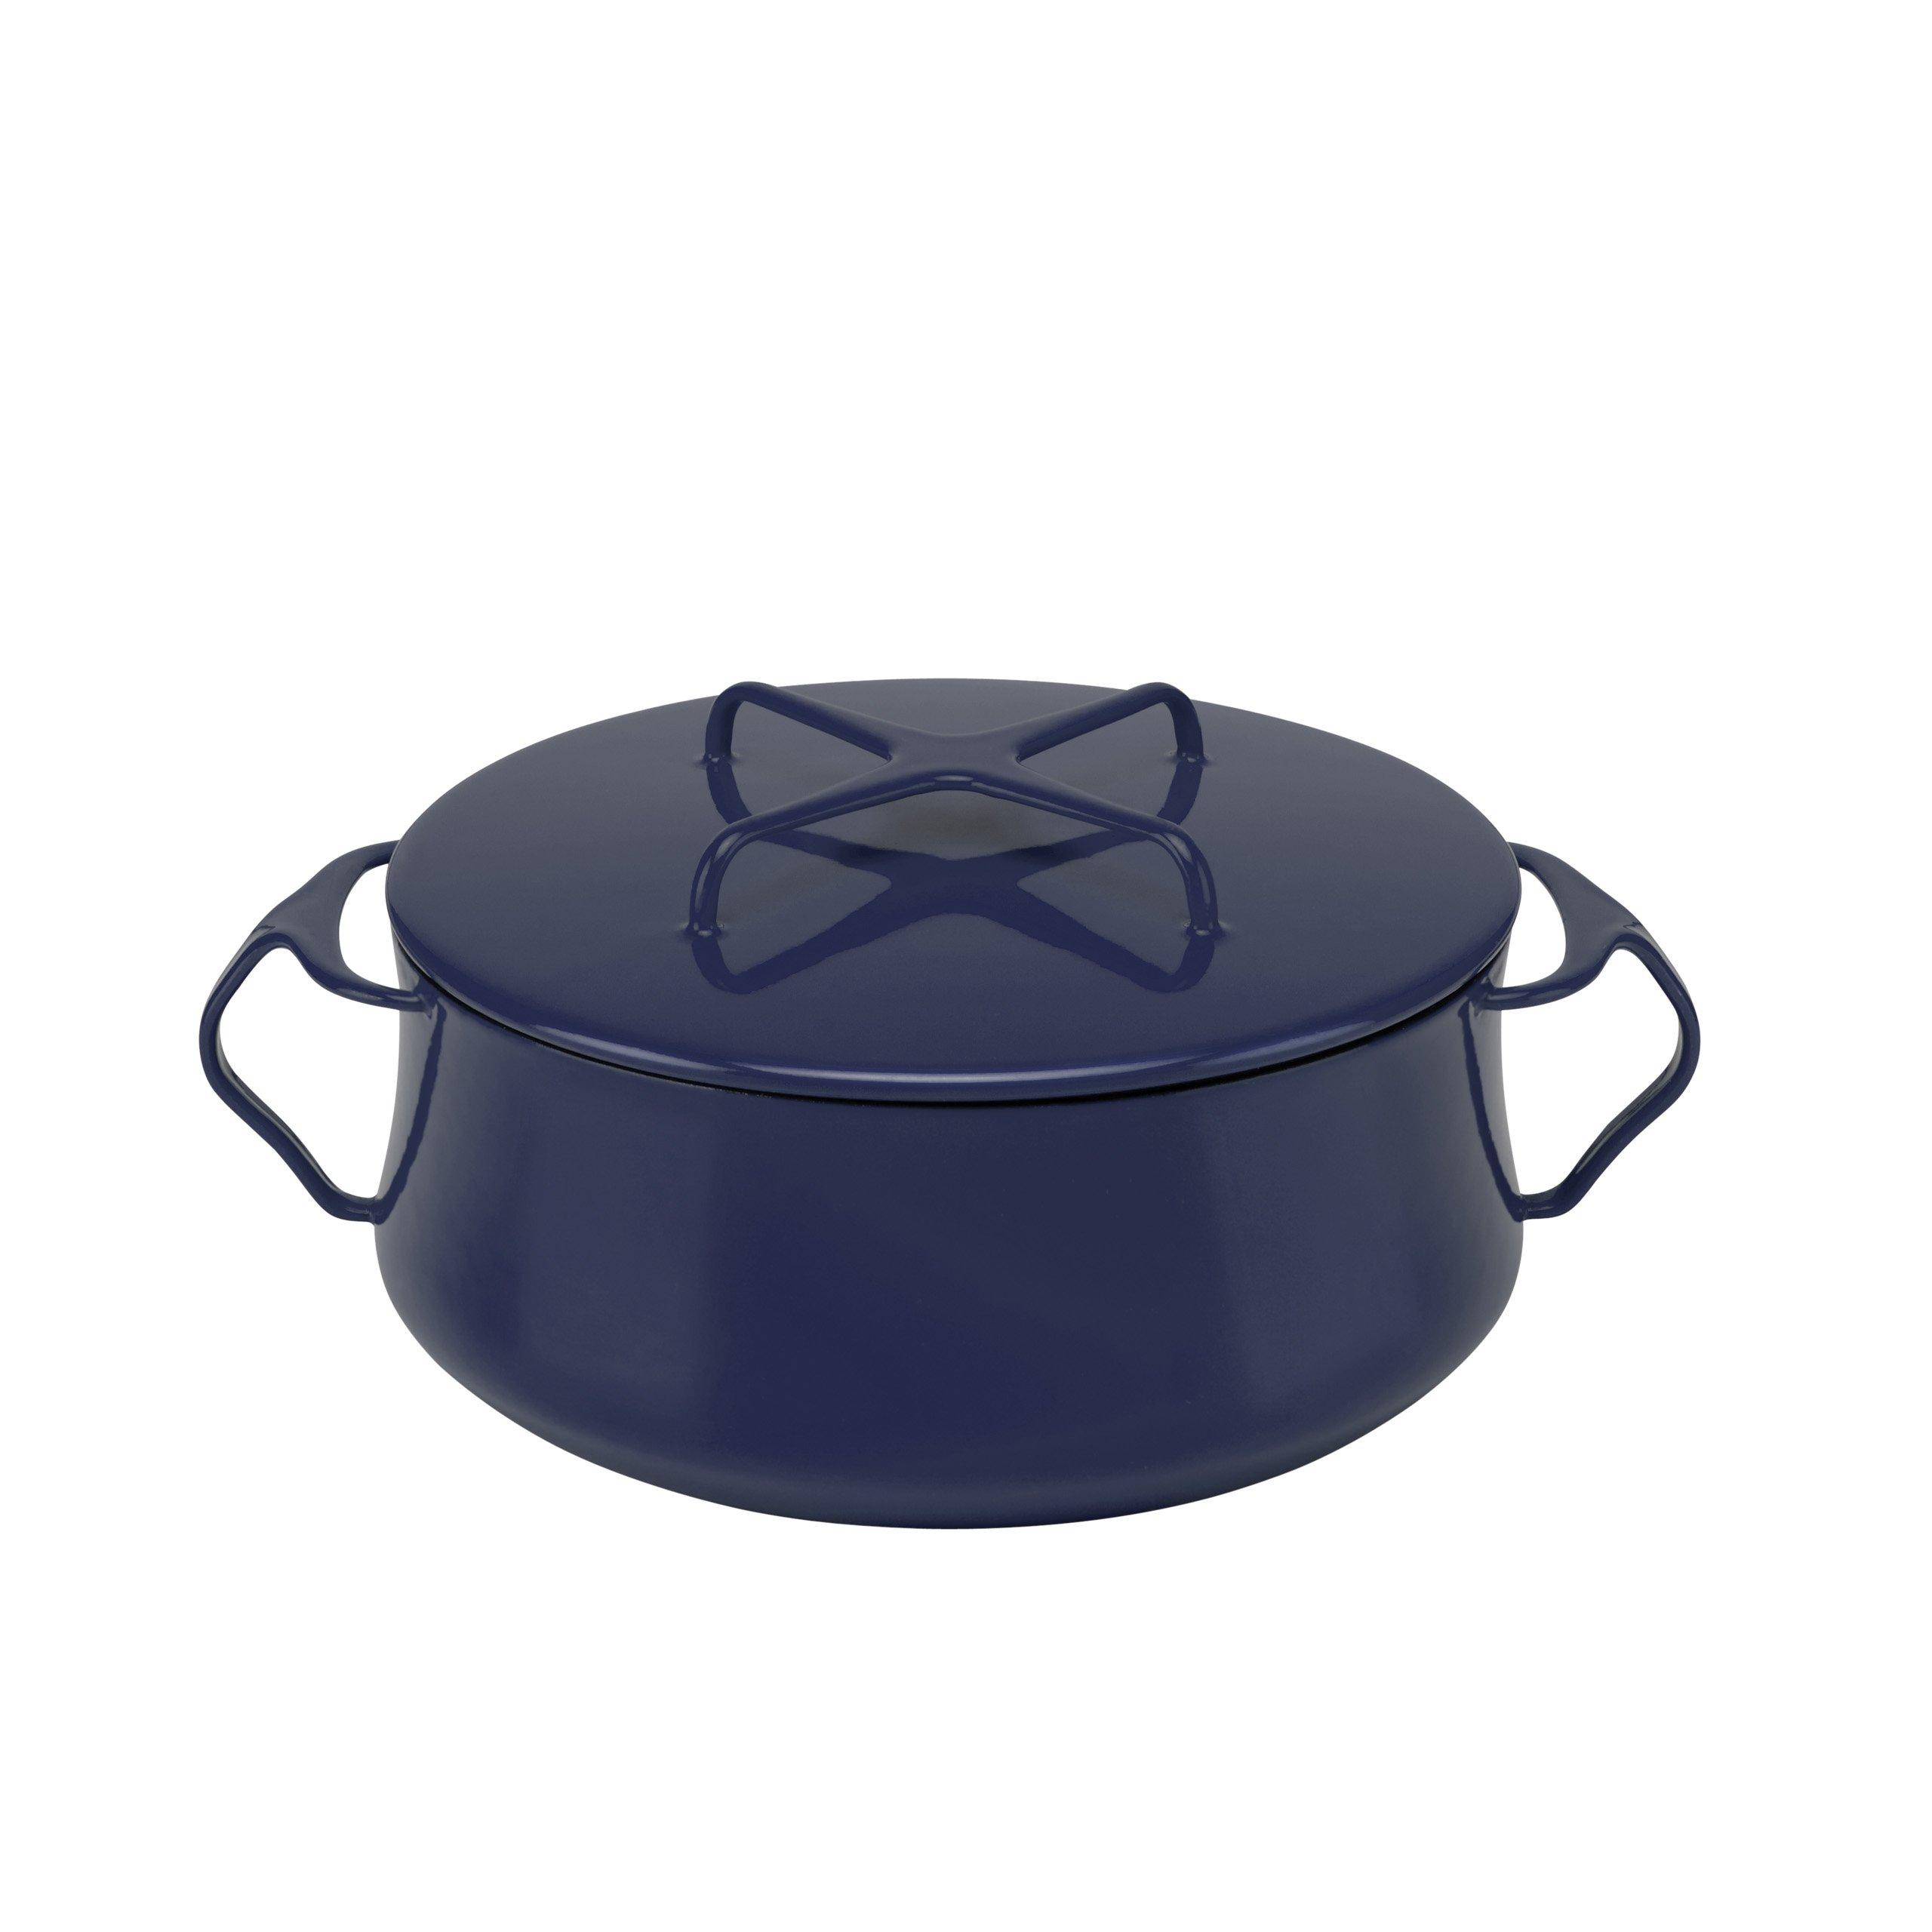 Dansk 834335 Kobenstyle Casserole, 4-Quart, Midnight Blue